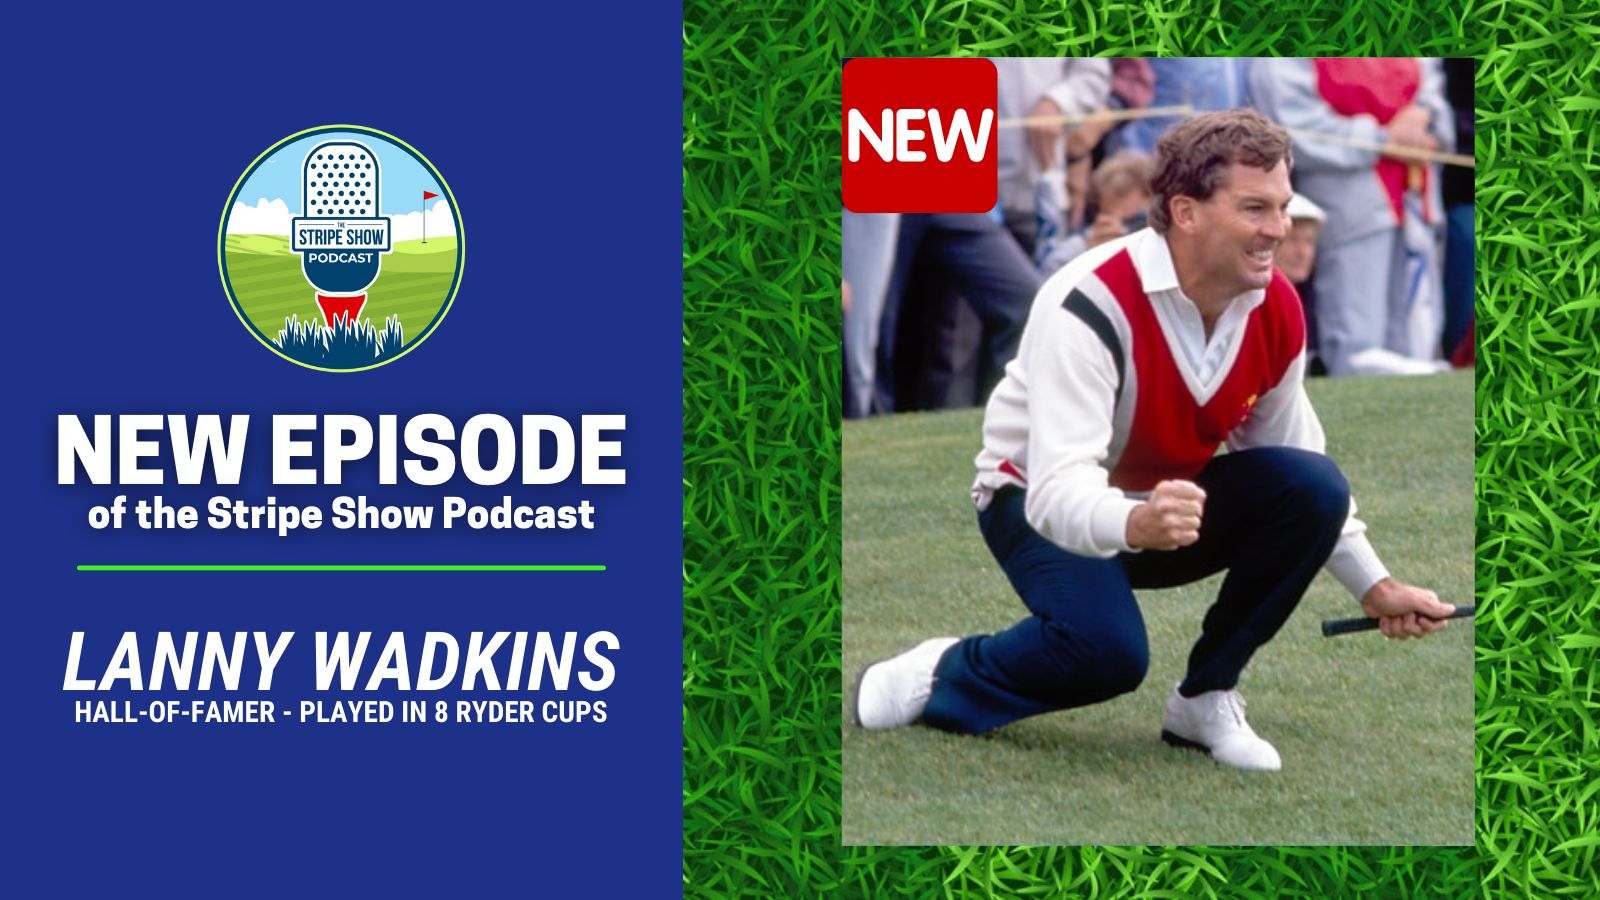 Hall-of-Famer and Former Ryder Cup Captain, Lanny Wadkins